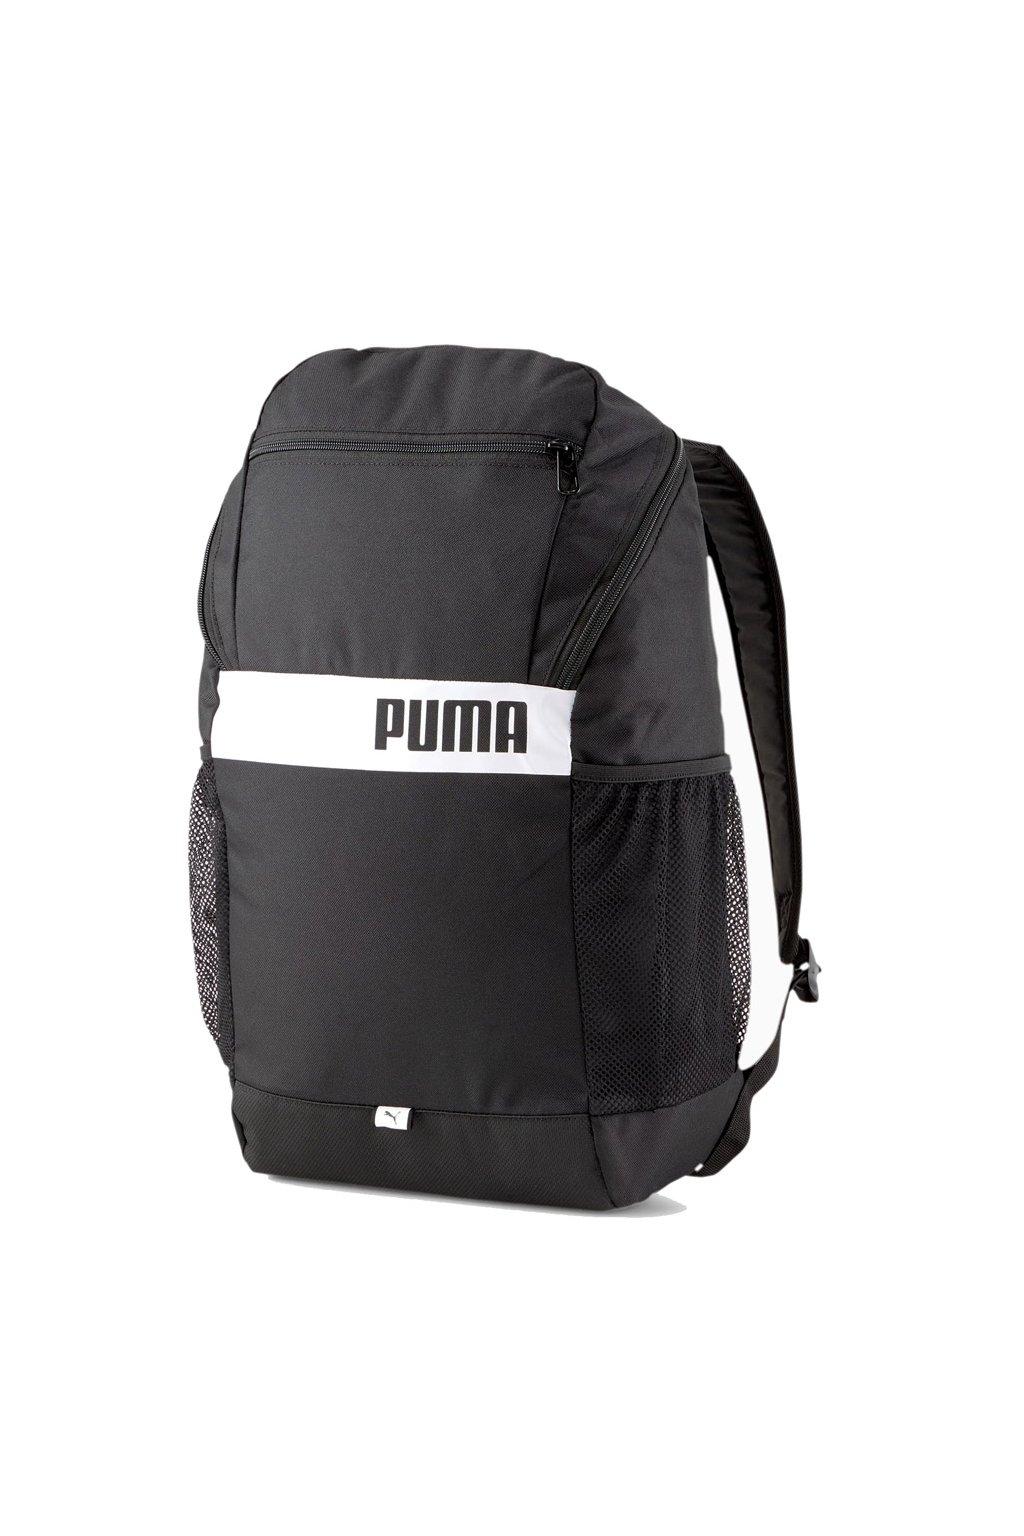 Batoh Puma Plus Backpack čierny 077292 01